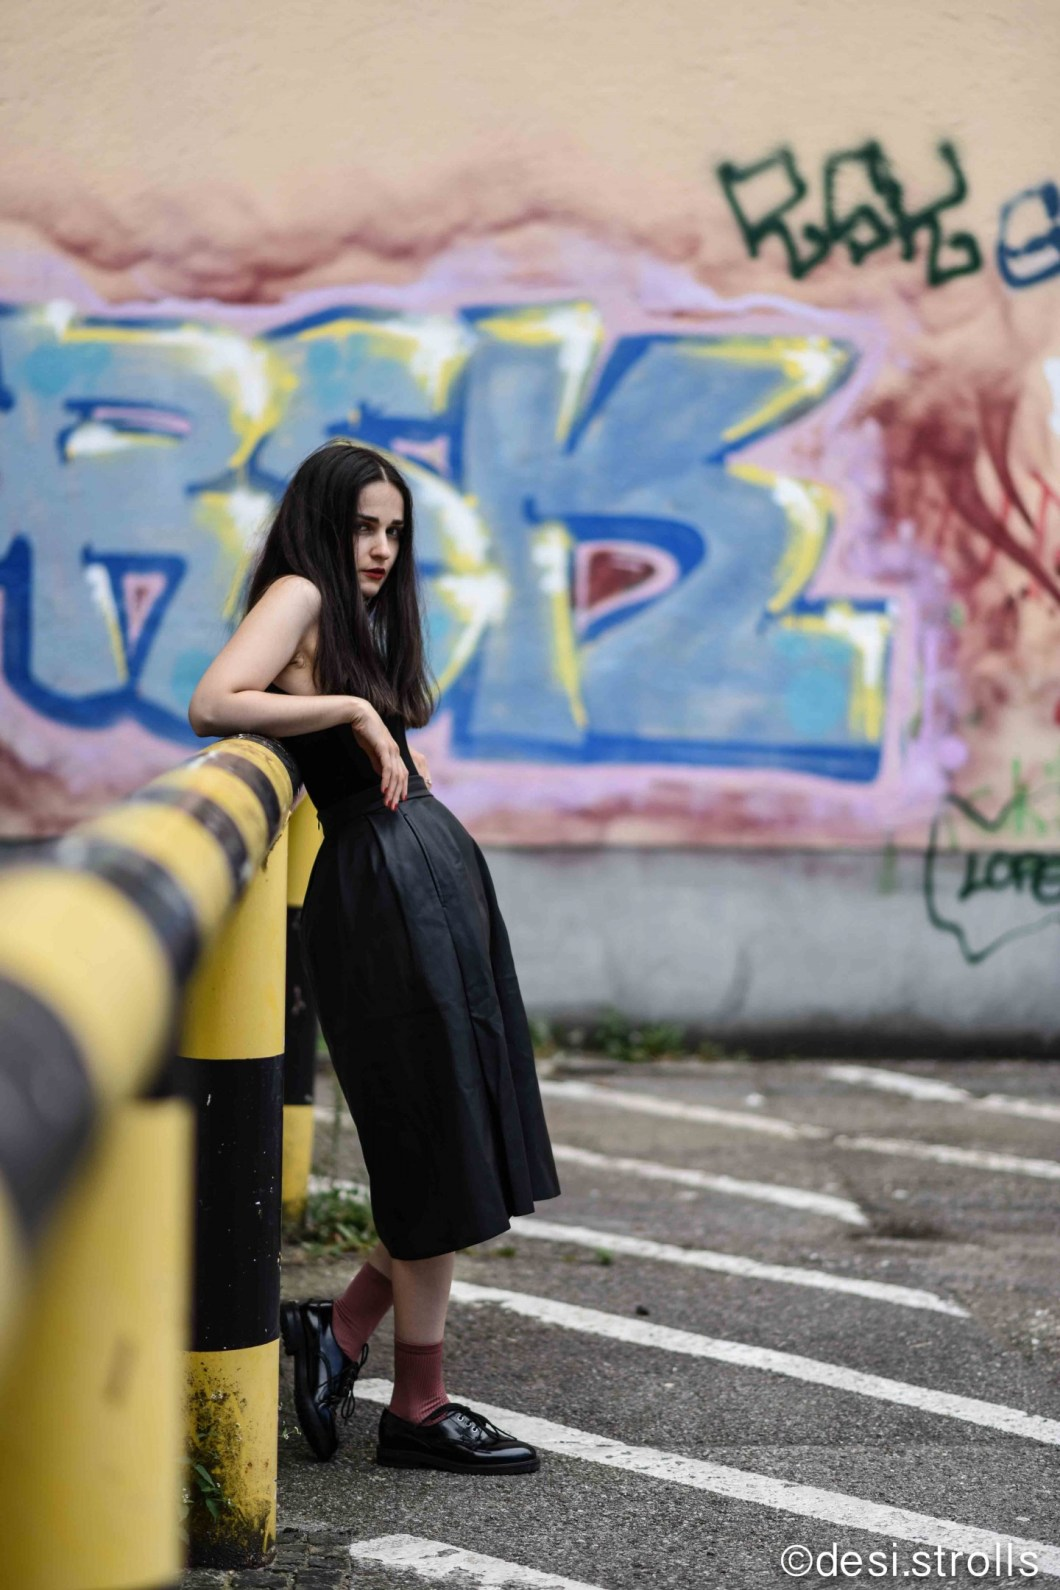 Desi.Strolls | How Far From Home